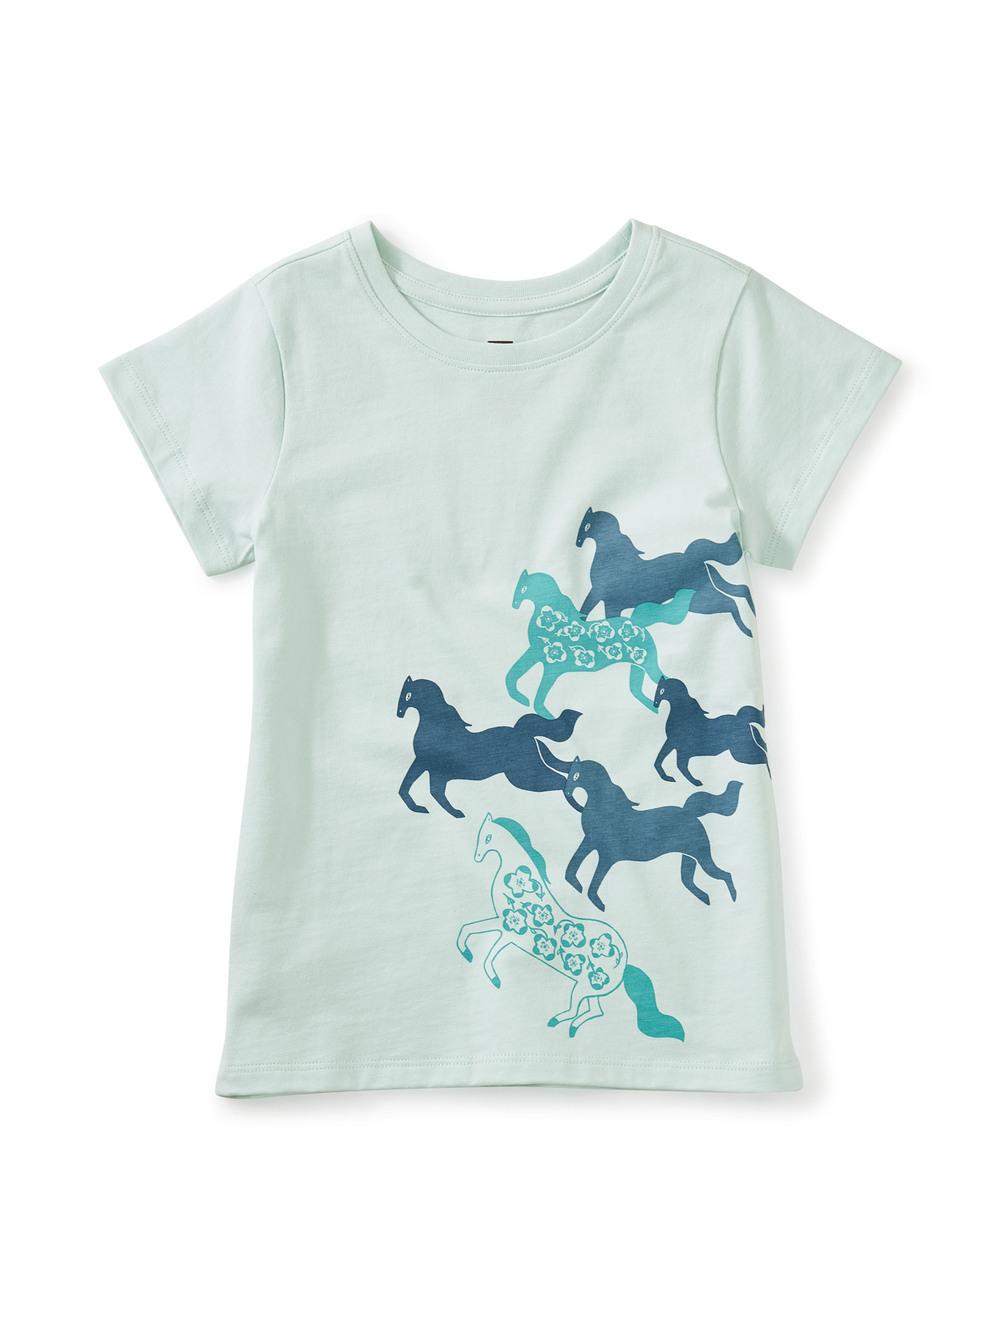 Iberian Horses Graphic Tee